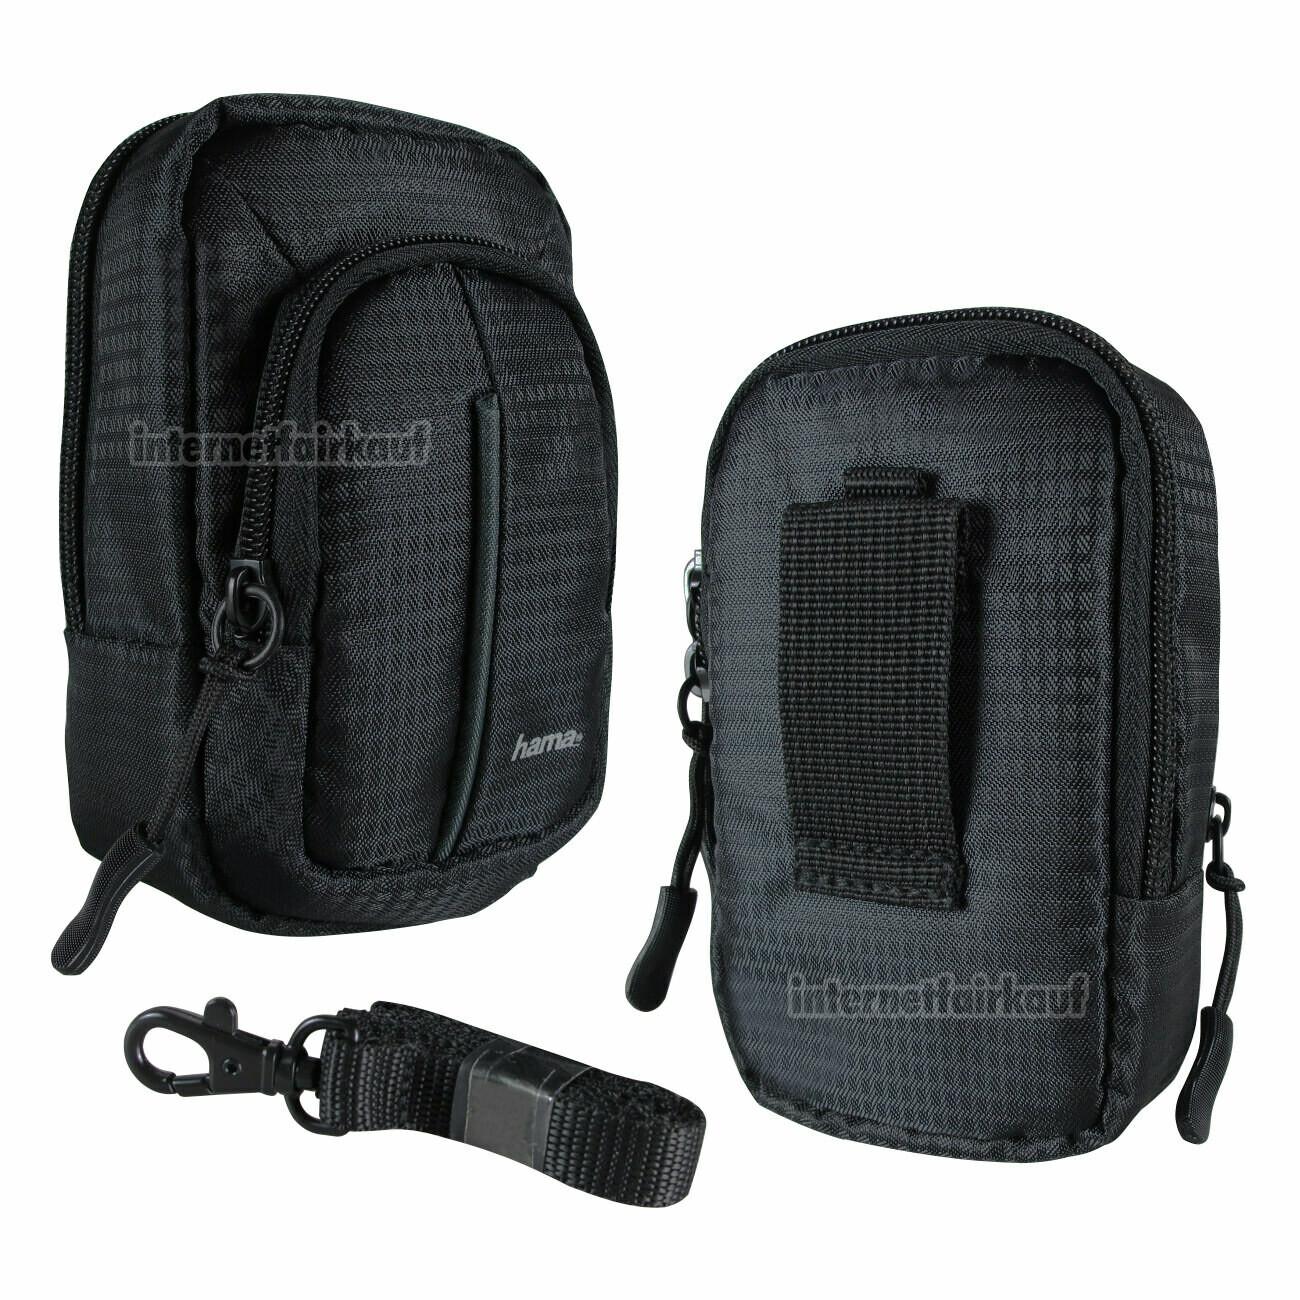 Fototasche Hama Kameratasche passend für Panasonic Lumix DMC-FT7